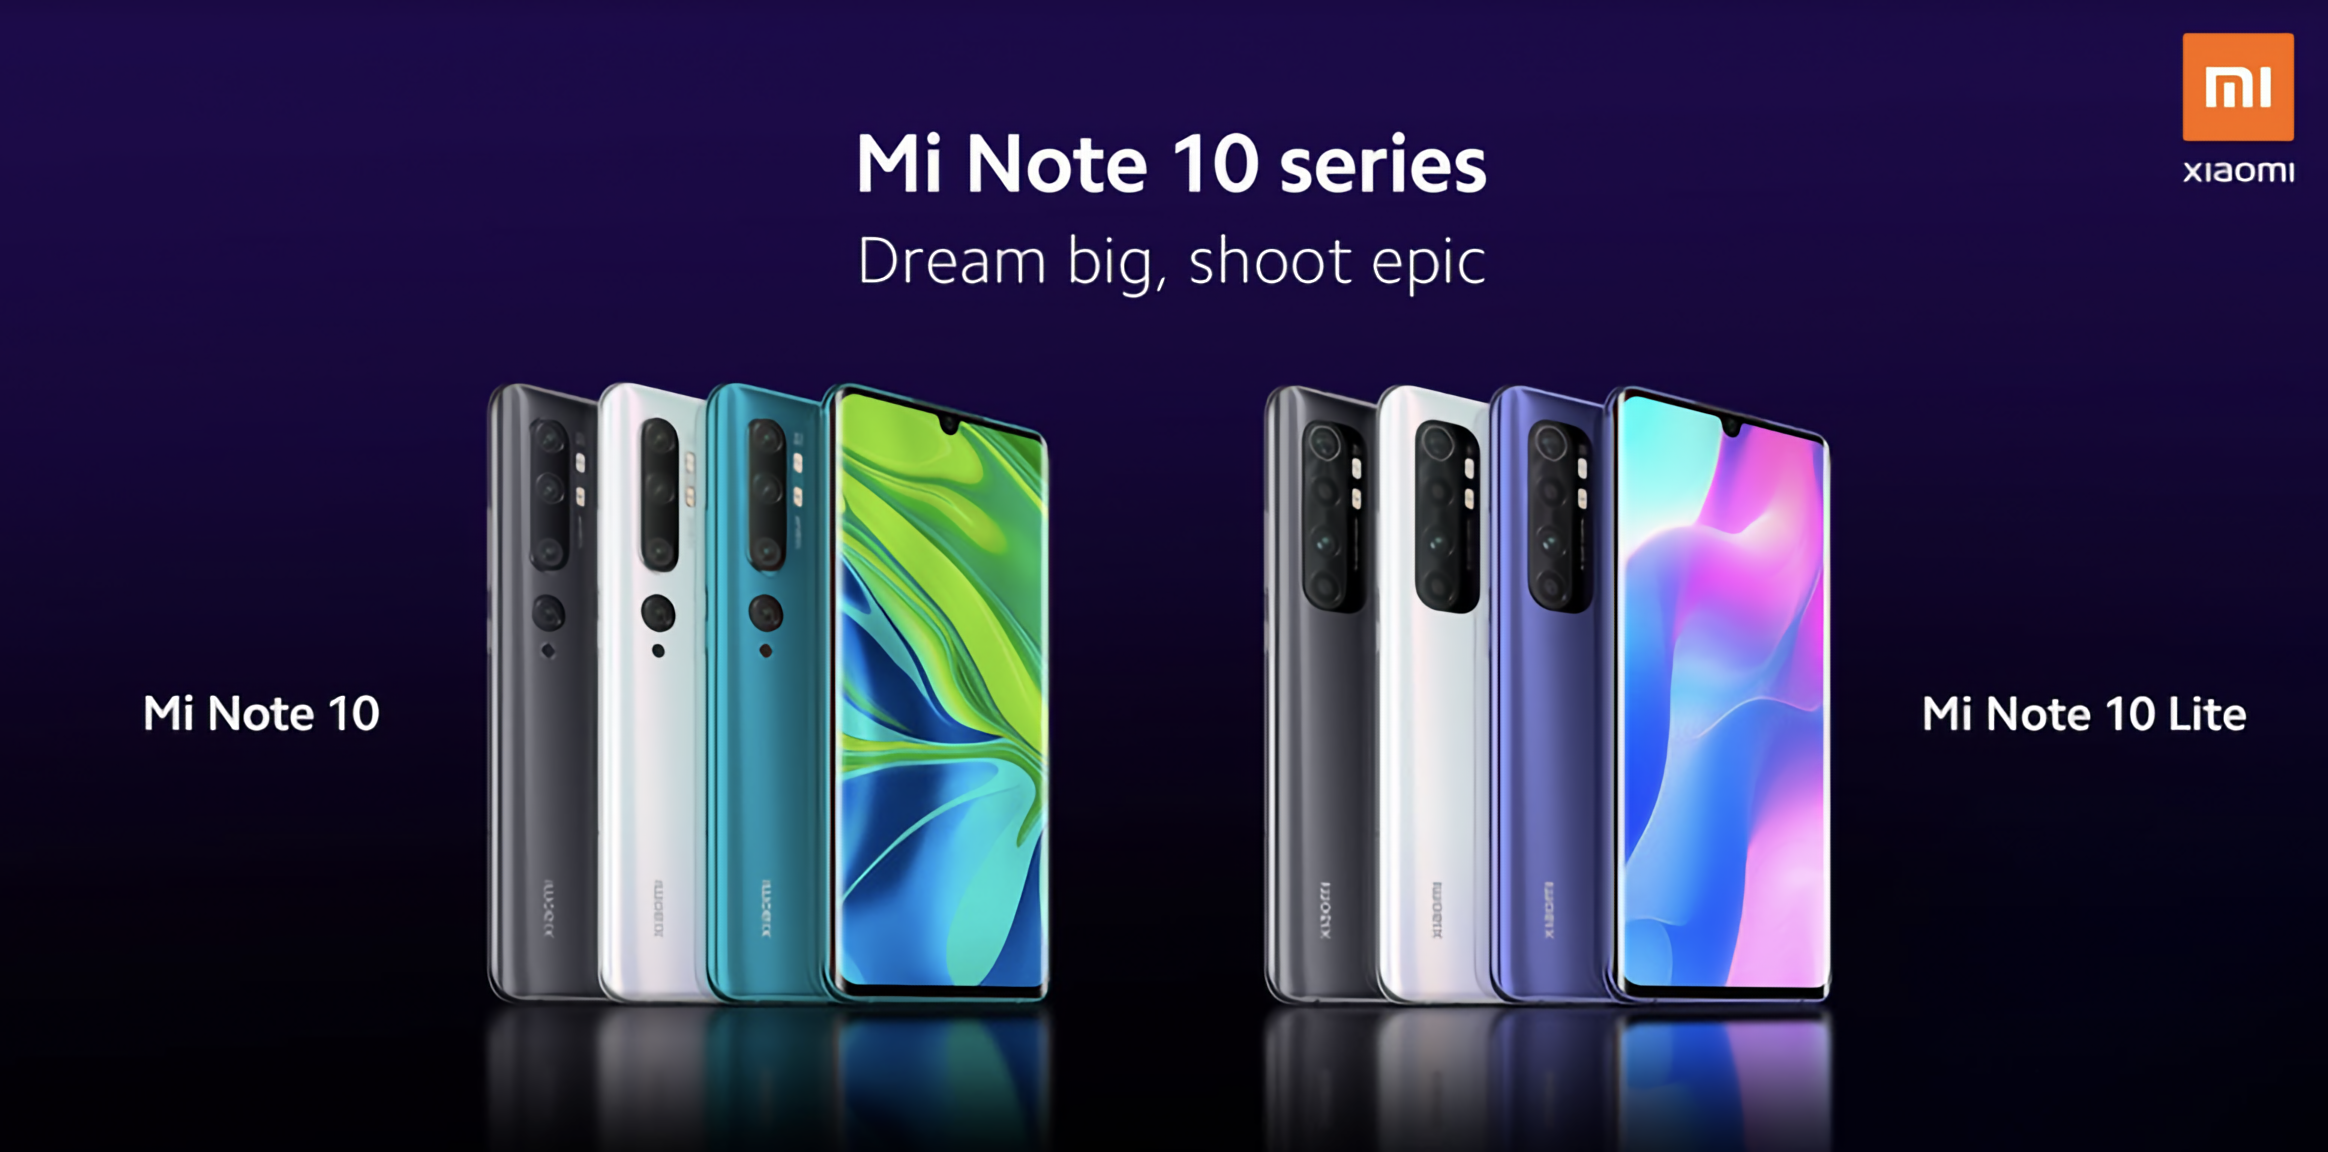 Не только Redmi Note 9 и Redmi Note 9 Pro: Xiaomi 30 апреля представит ещё смартфон Mi Note 10 Lite